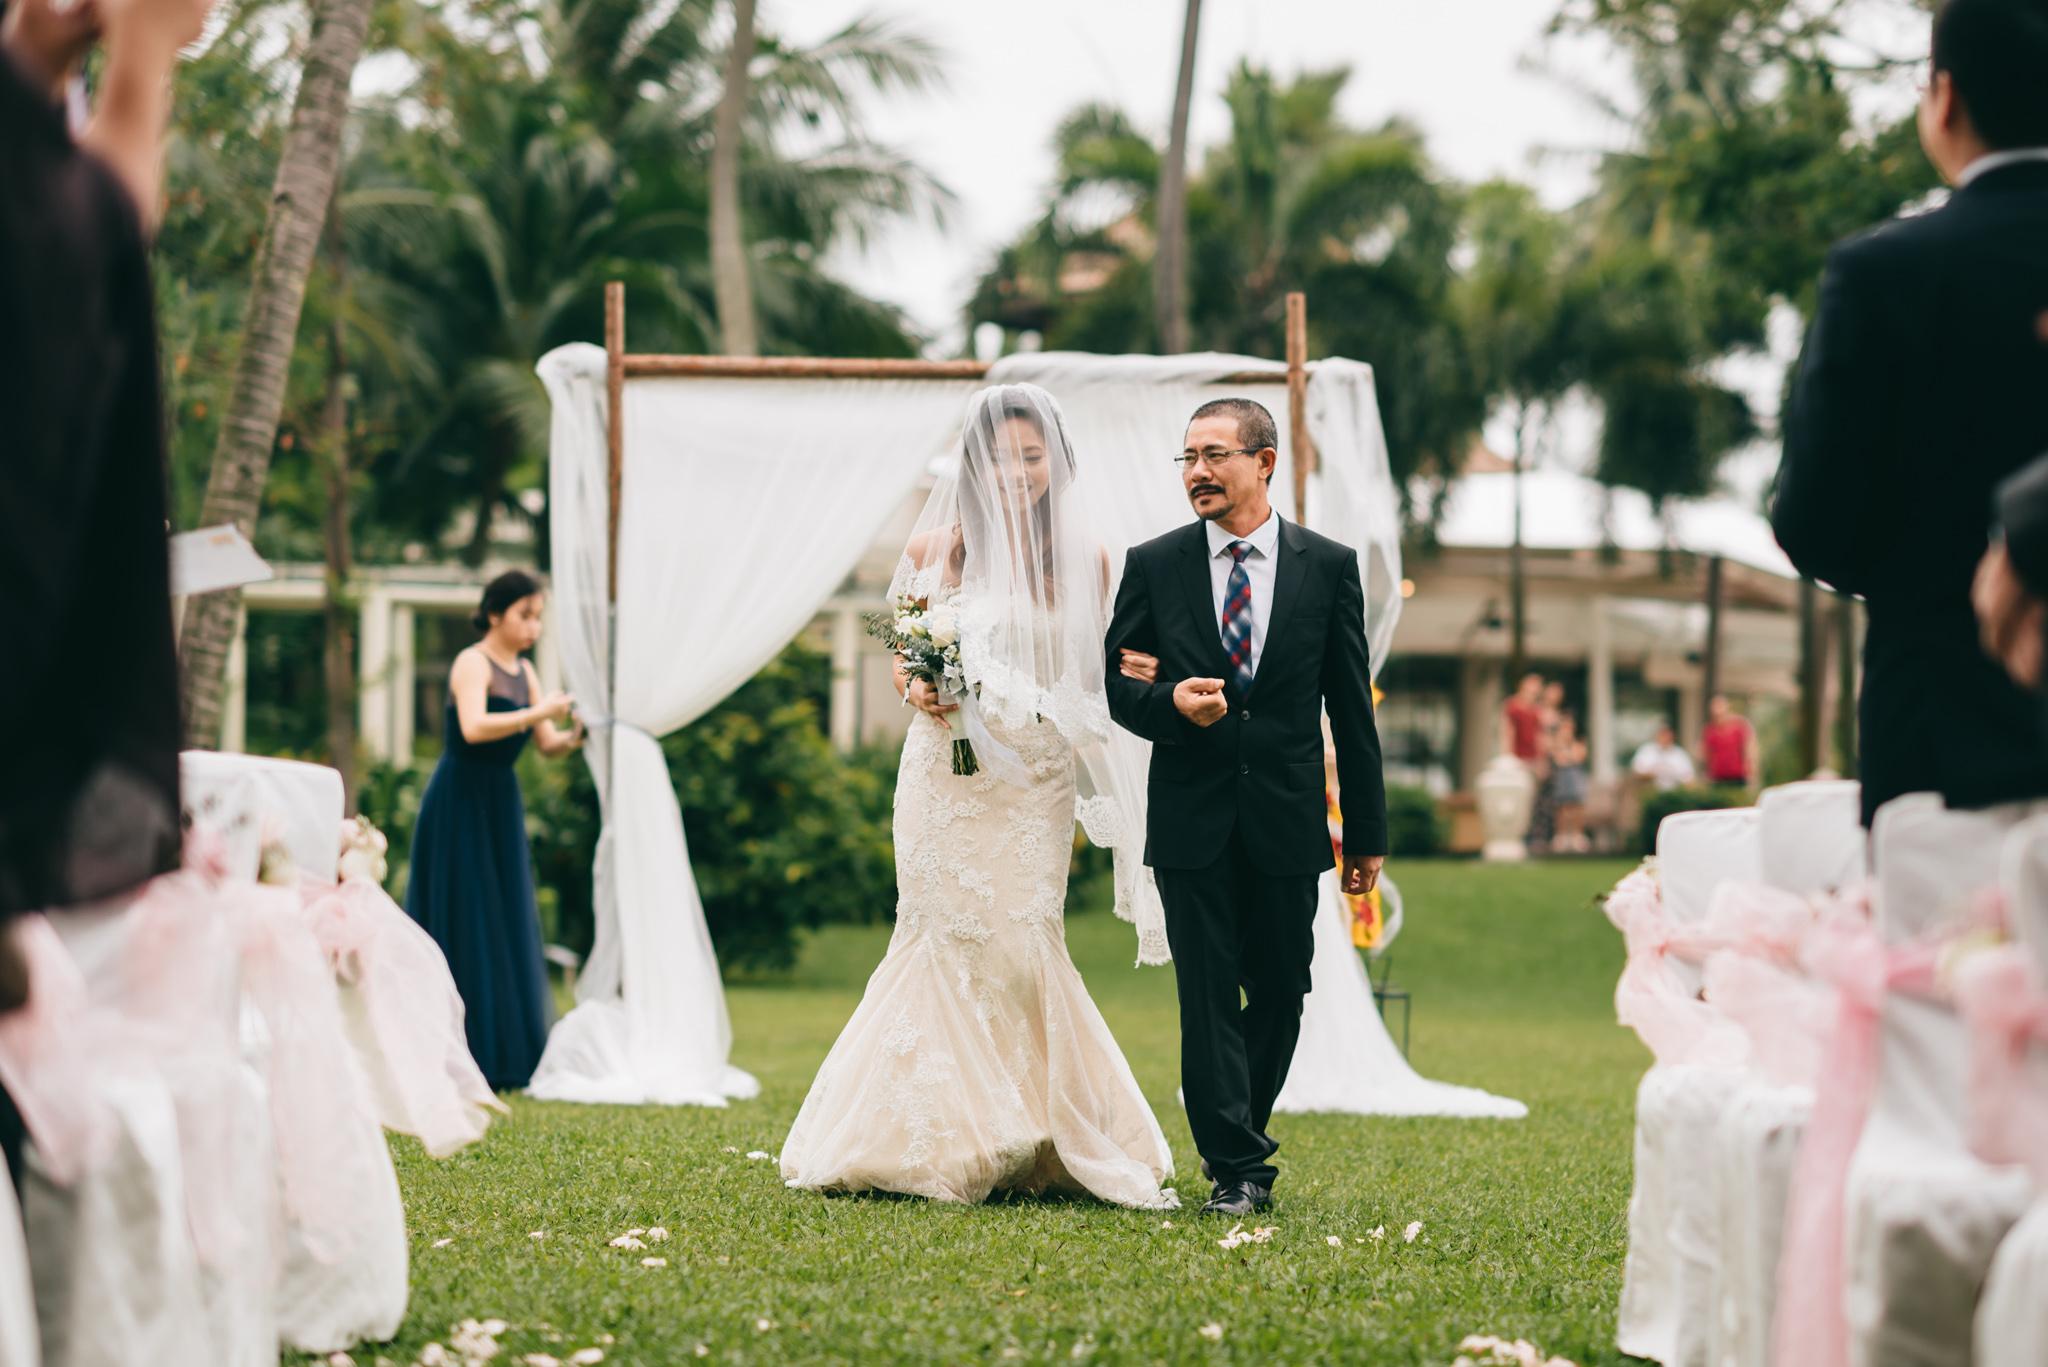 Basil & Vani Wedding Day Highlights (resized for sharing) - 098.jpg